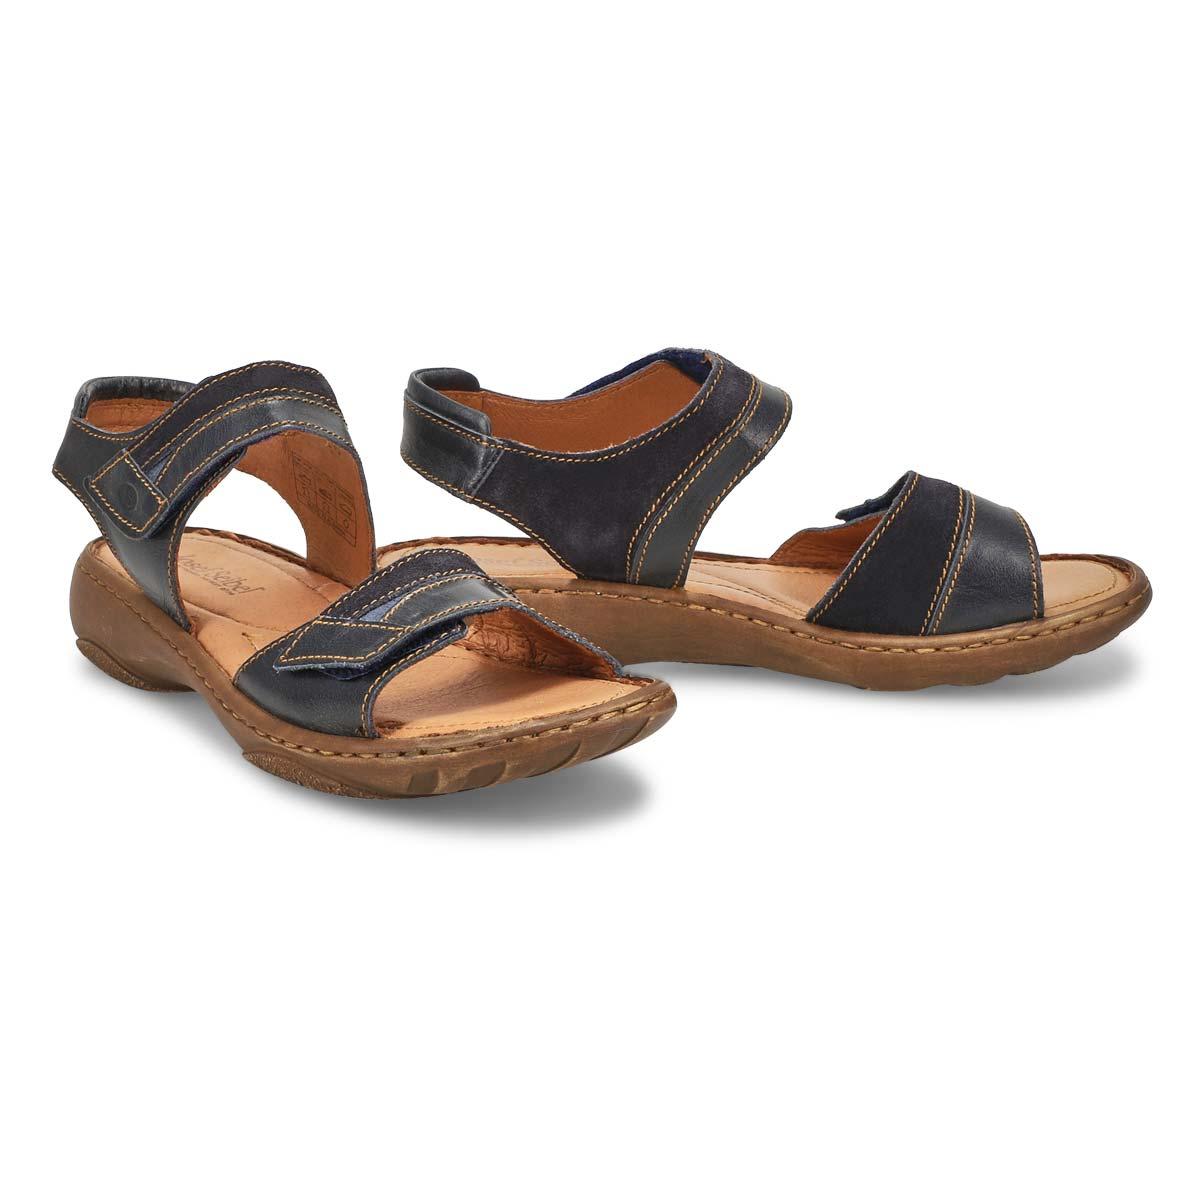 Women's Debra 19 Casual 2 Strap Sandal - Blue